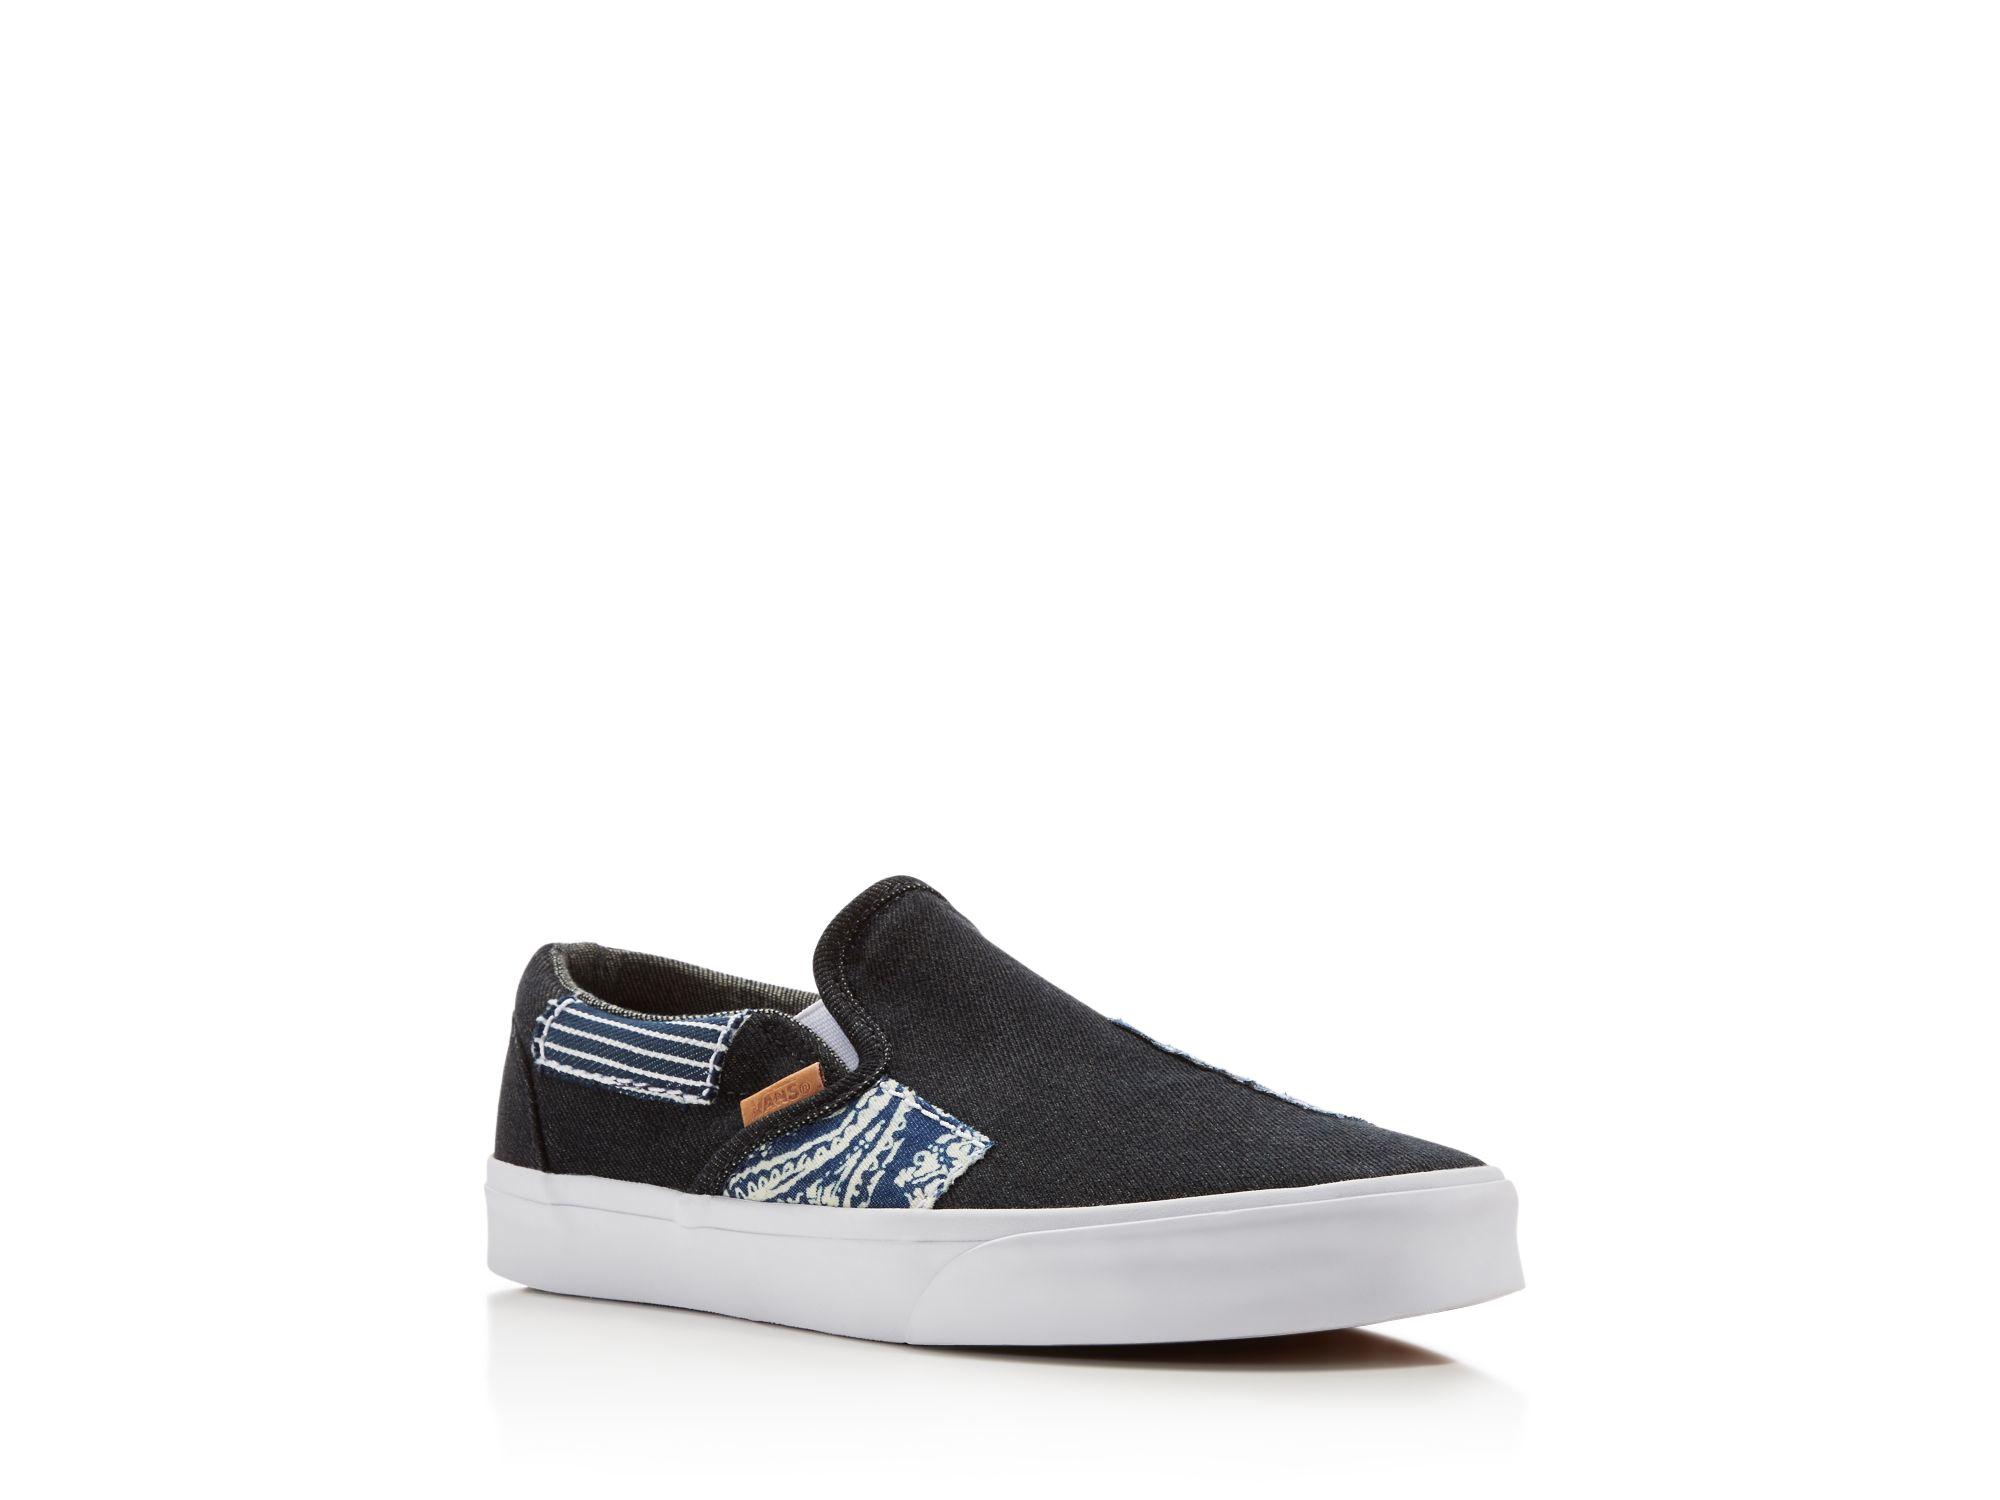 32482ed30c Lyst - Vans Classic Ca Denim Patchwork Slip On Sneakers in Blue for Men